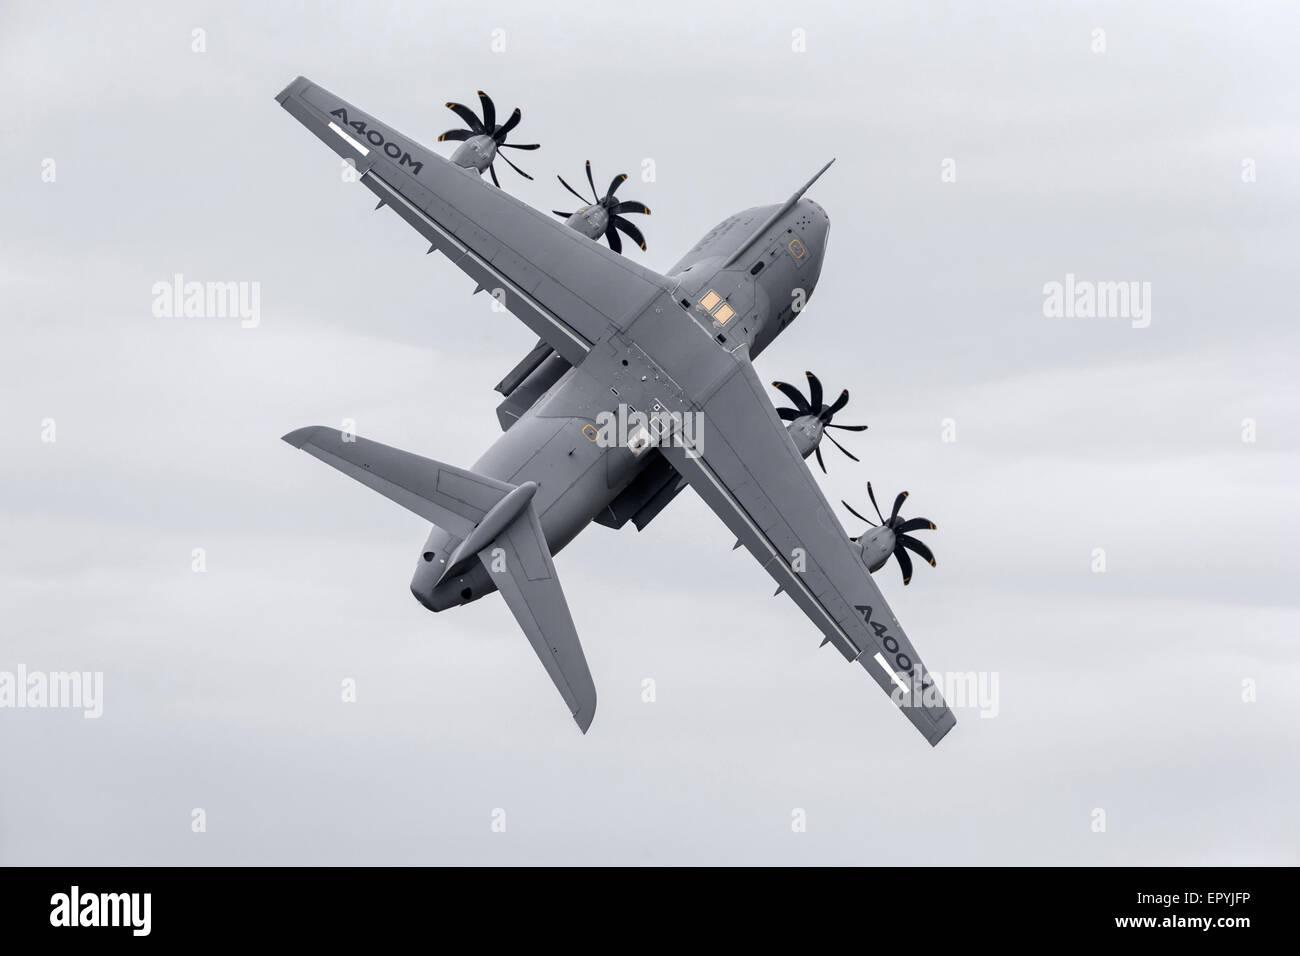 Airbus A400M Atlas transport aircraft - Stock Image